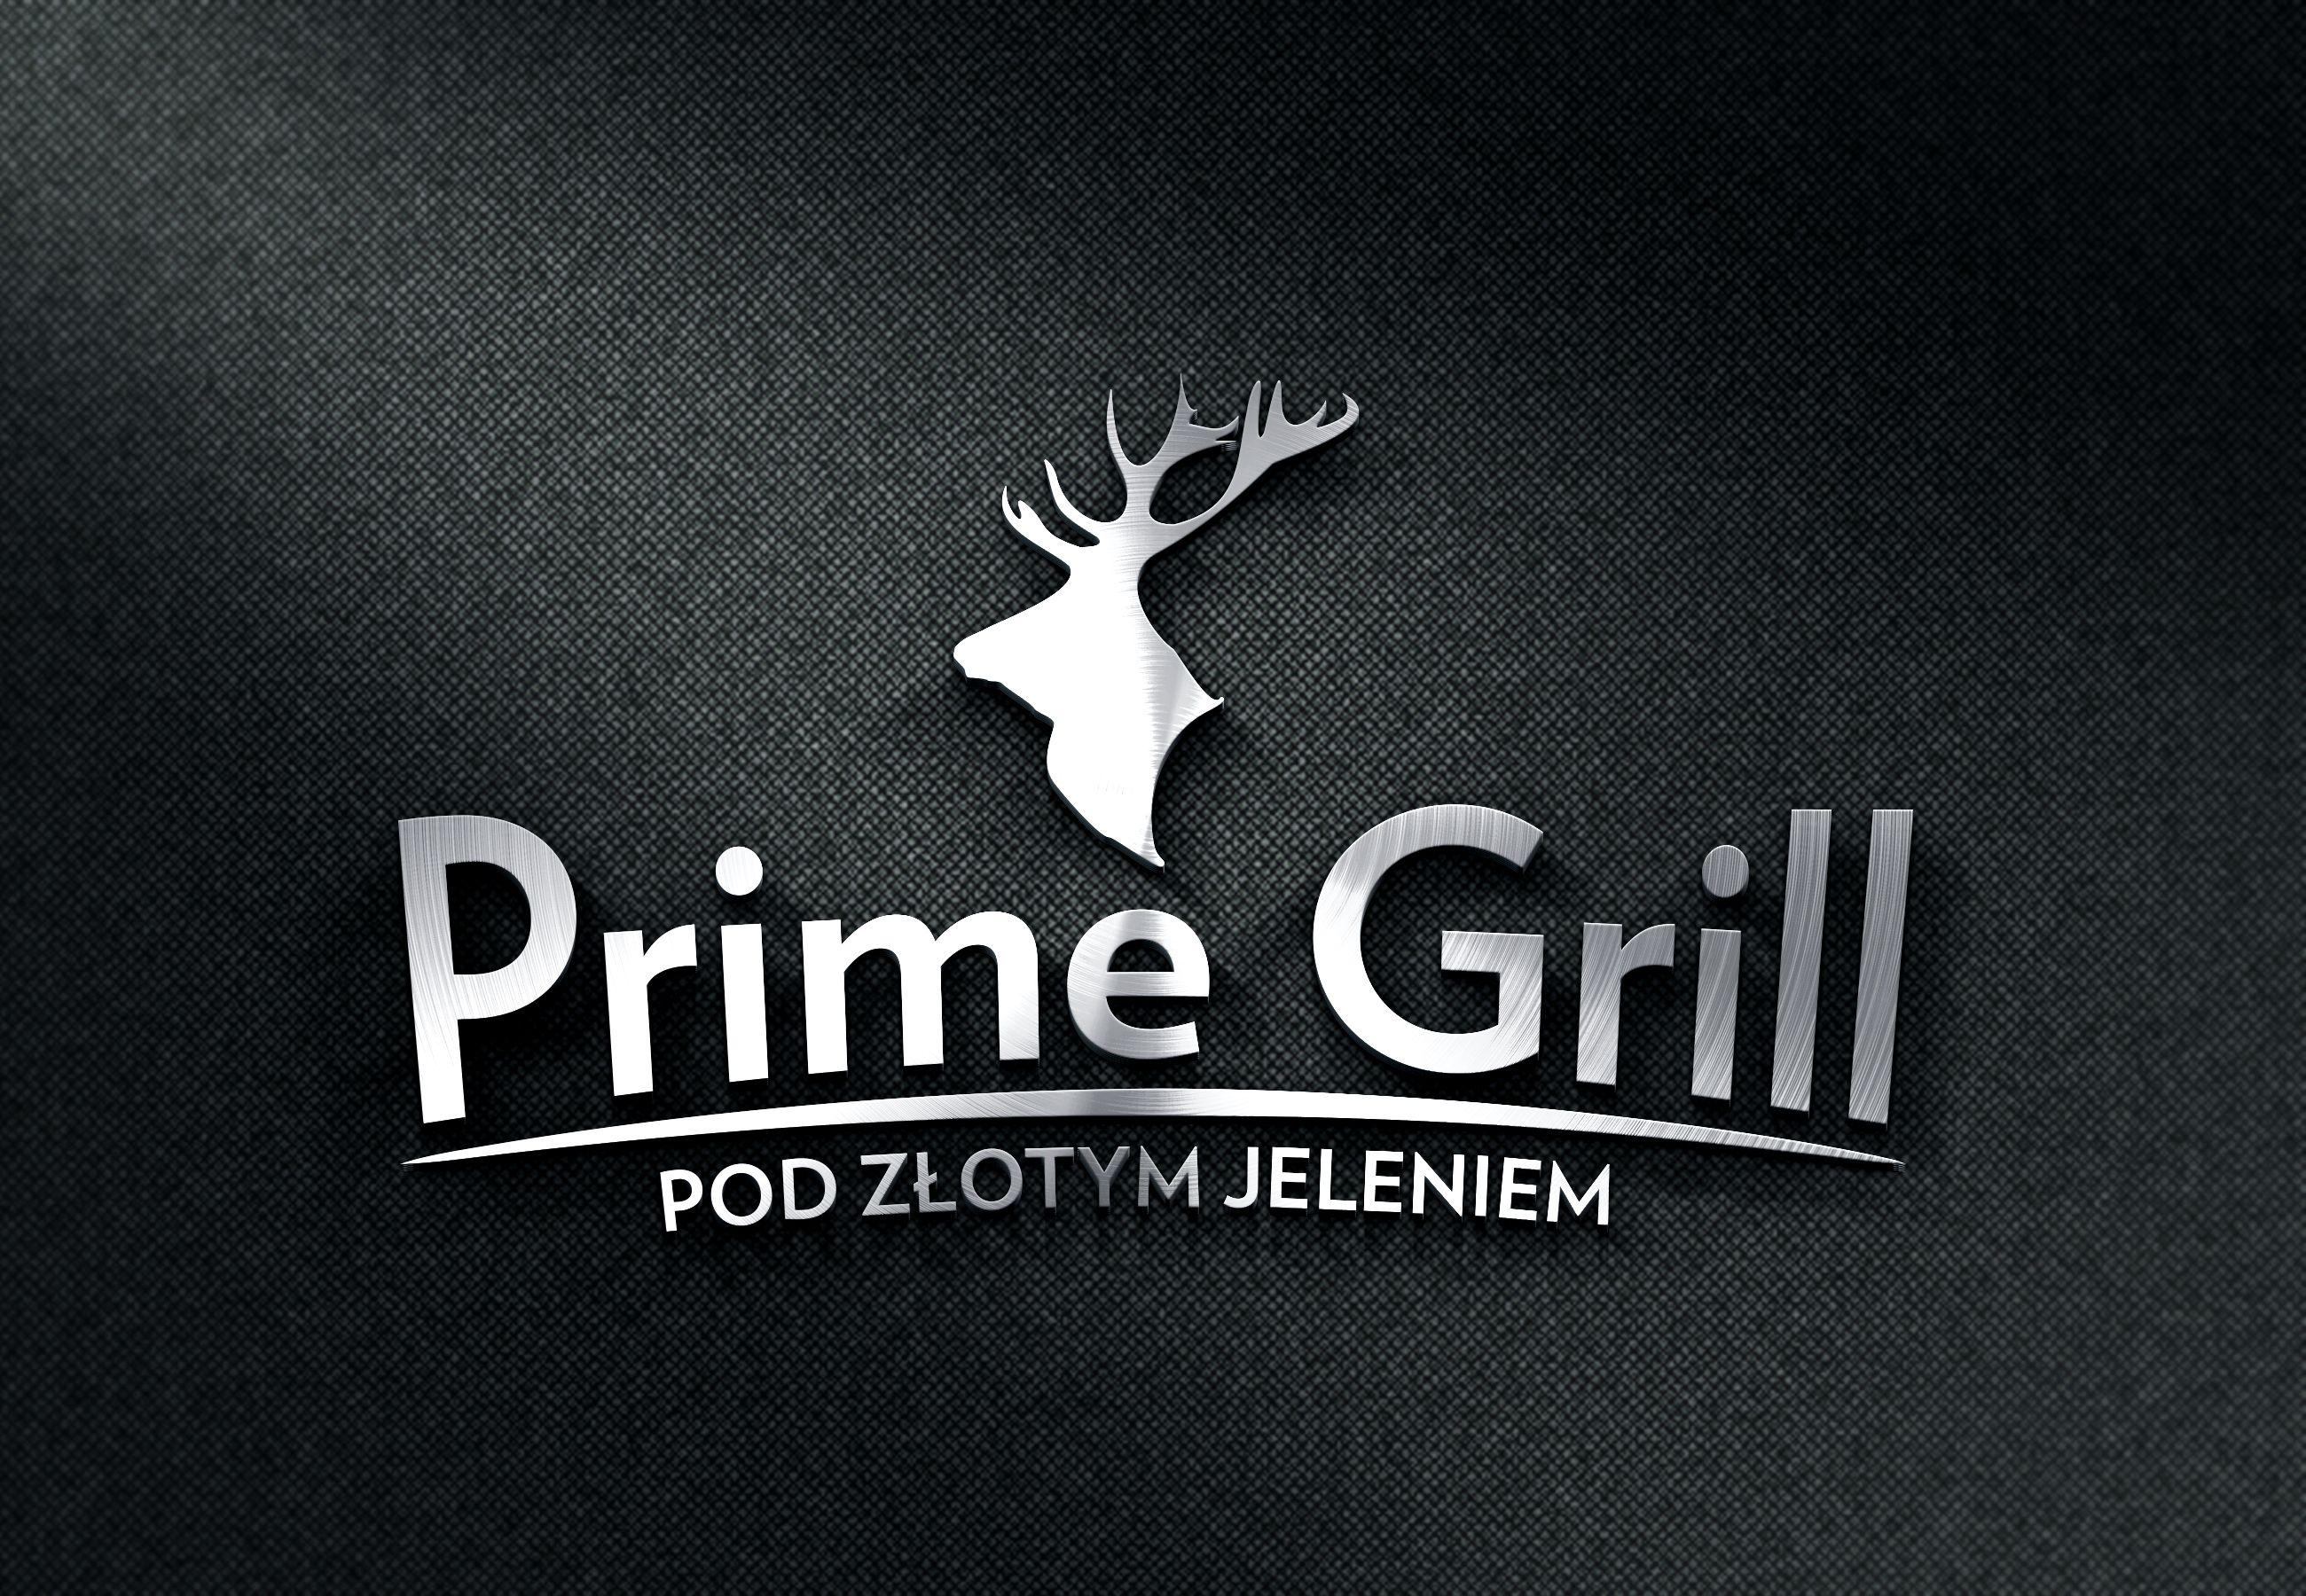 Prime Grill logo Modus design lotype